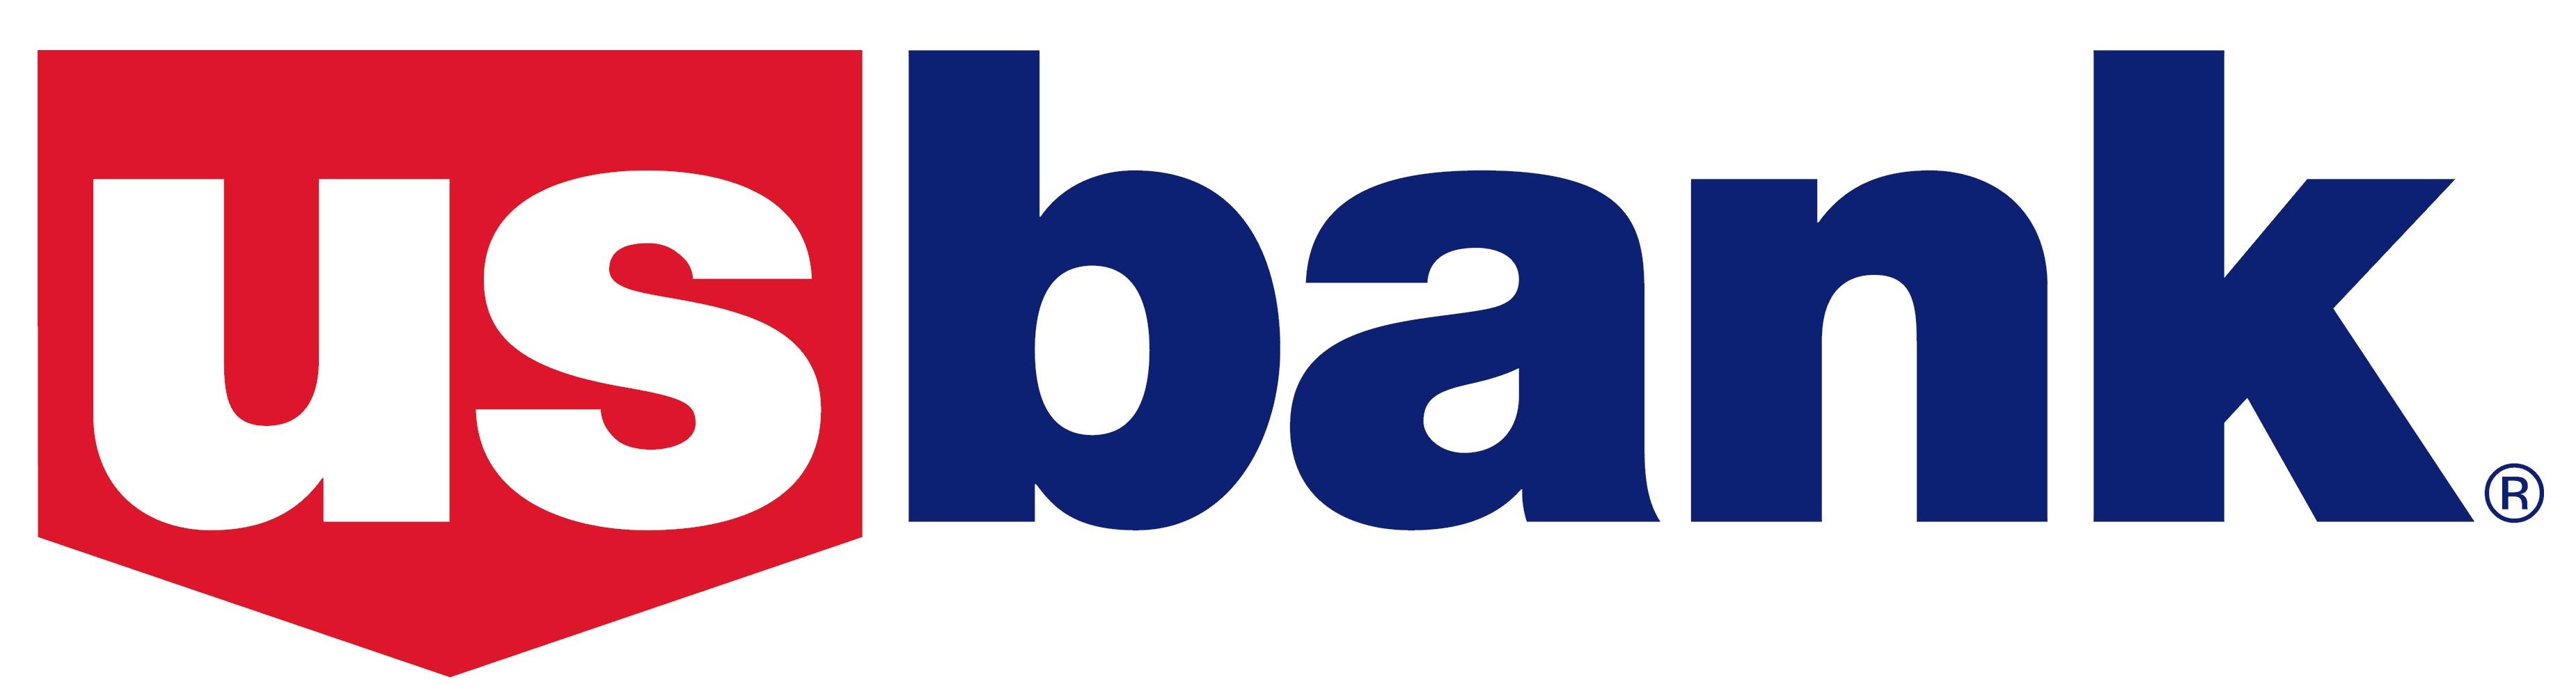 U.S. Bank logo, logotype, emblem